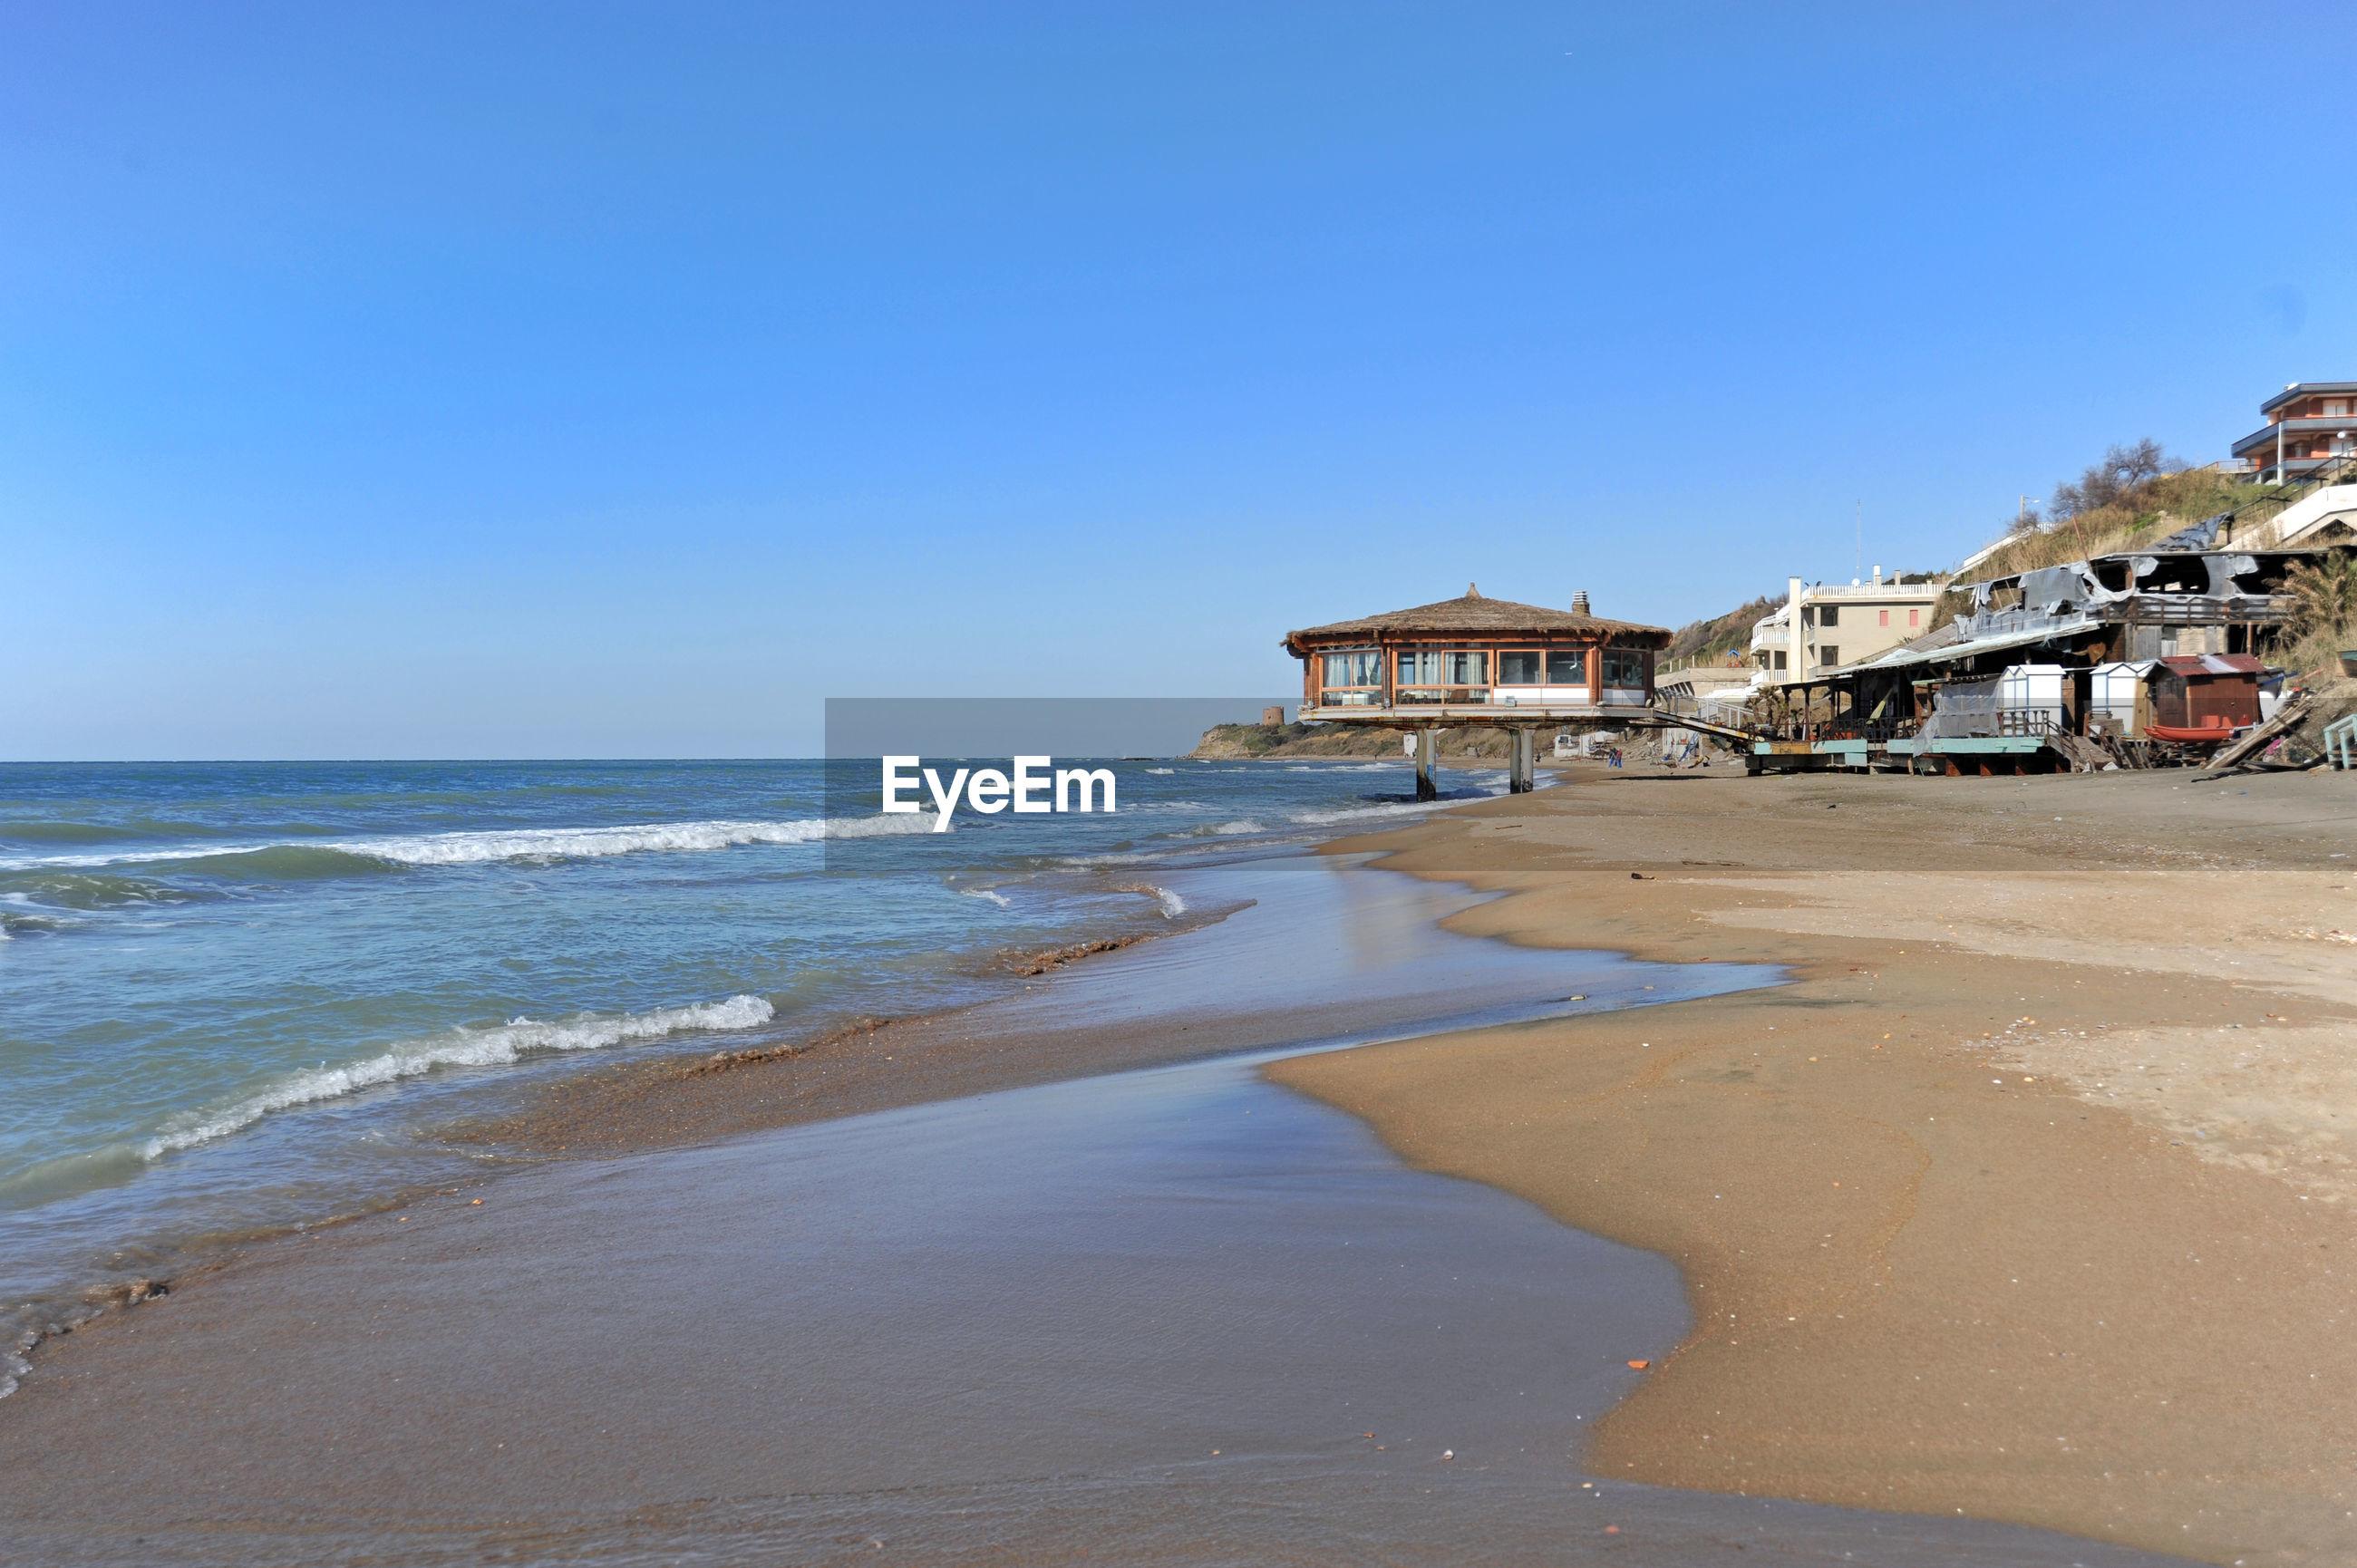 BEACH BY SEA AGAINST CLEAR BLUE SKY